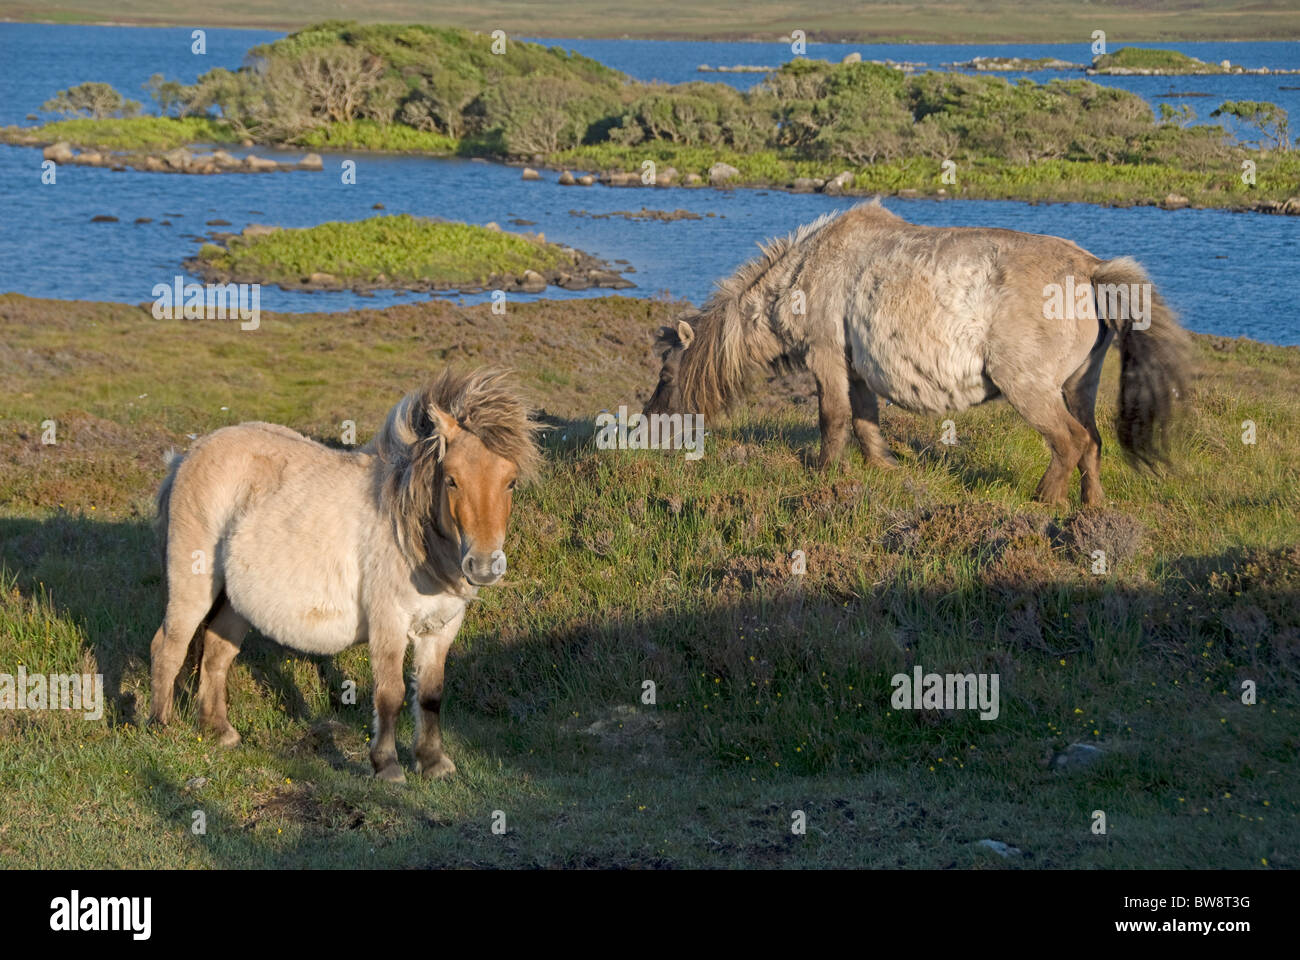 Loch Druidibeg South Uist, Outer Hebrides, Western Isles, Scotland.  SCO 6489 - Stock Image